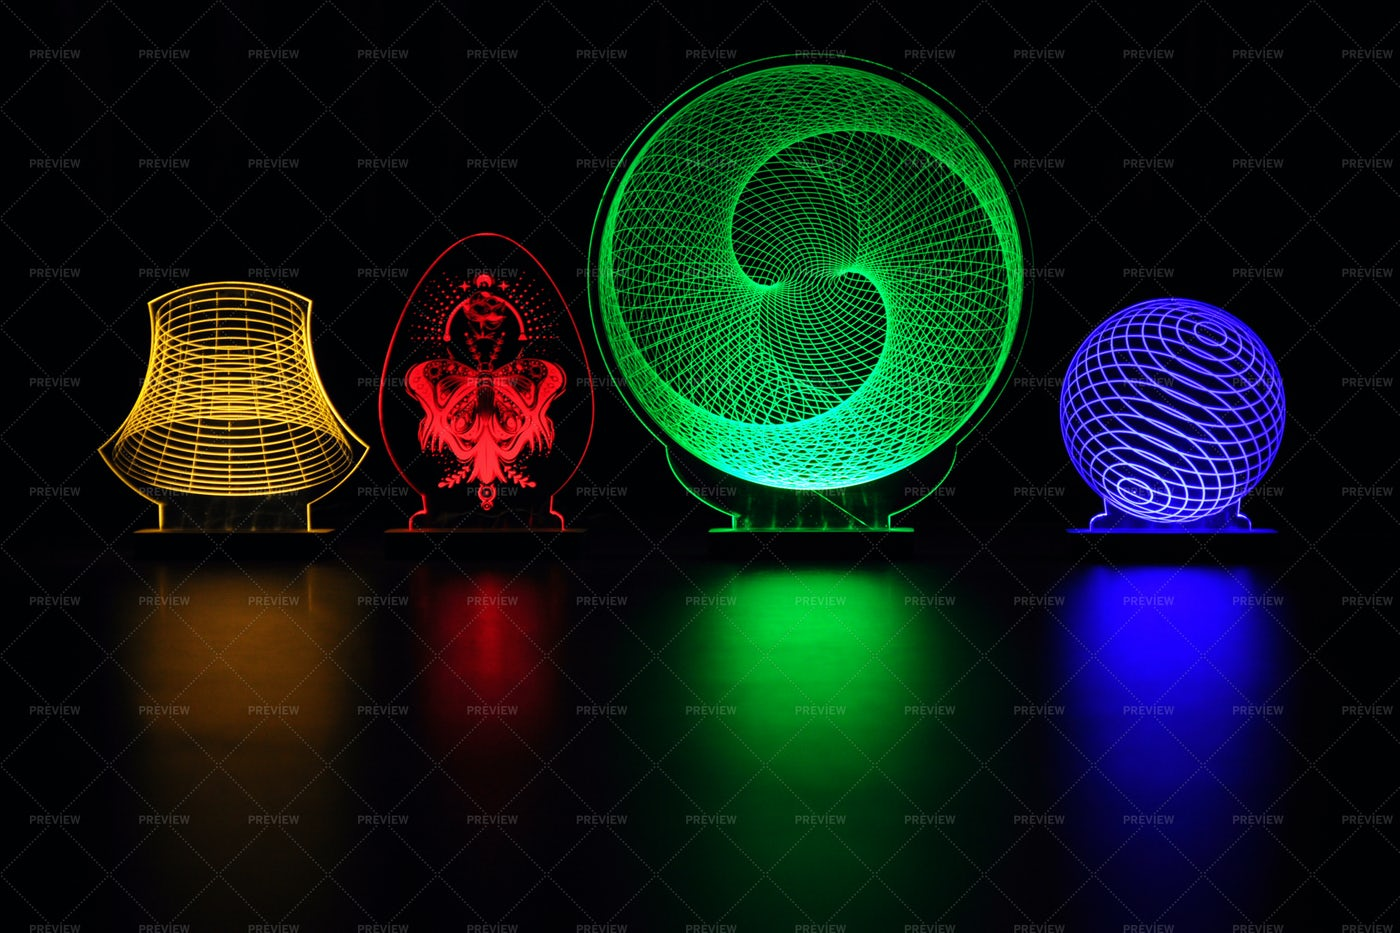 Handmade Decorative Lamps: Stock Photos